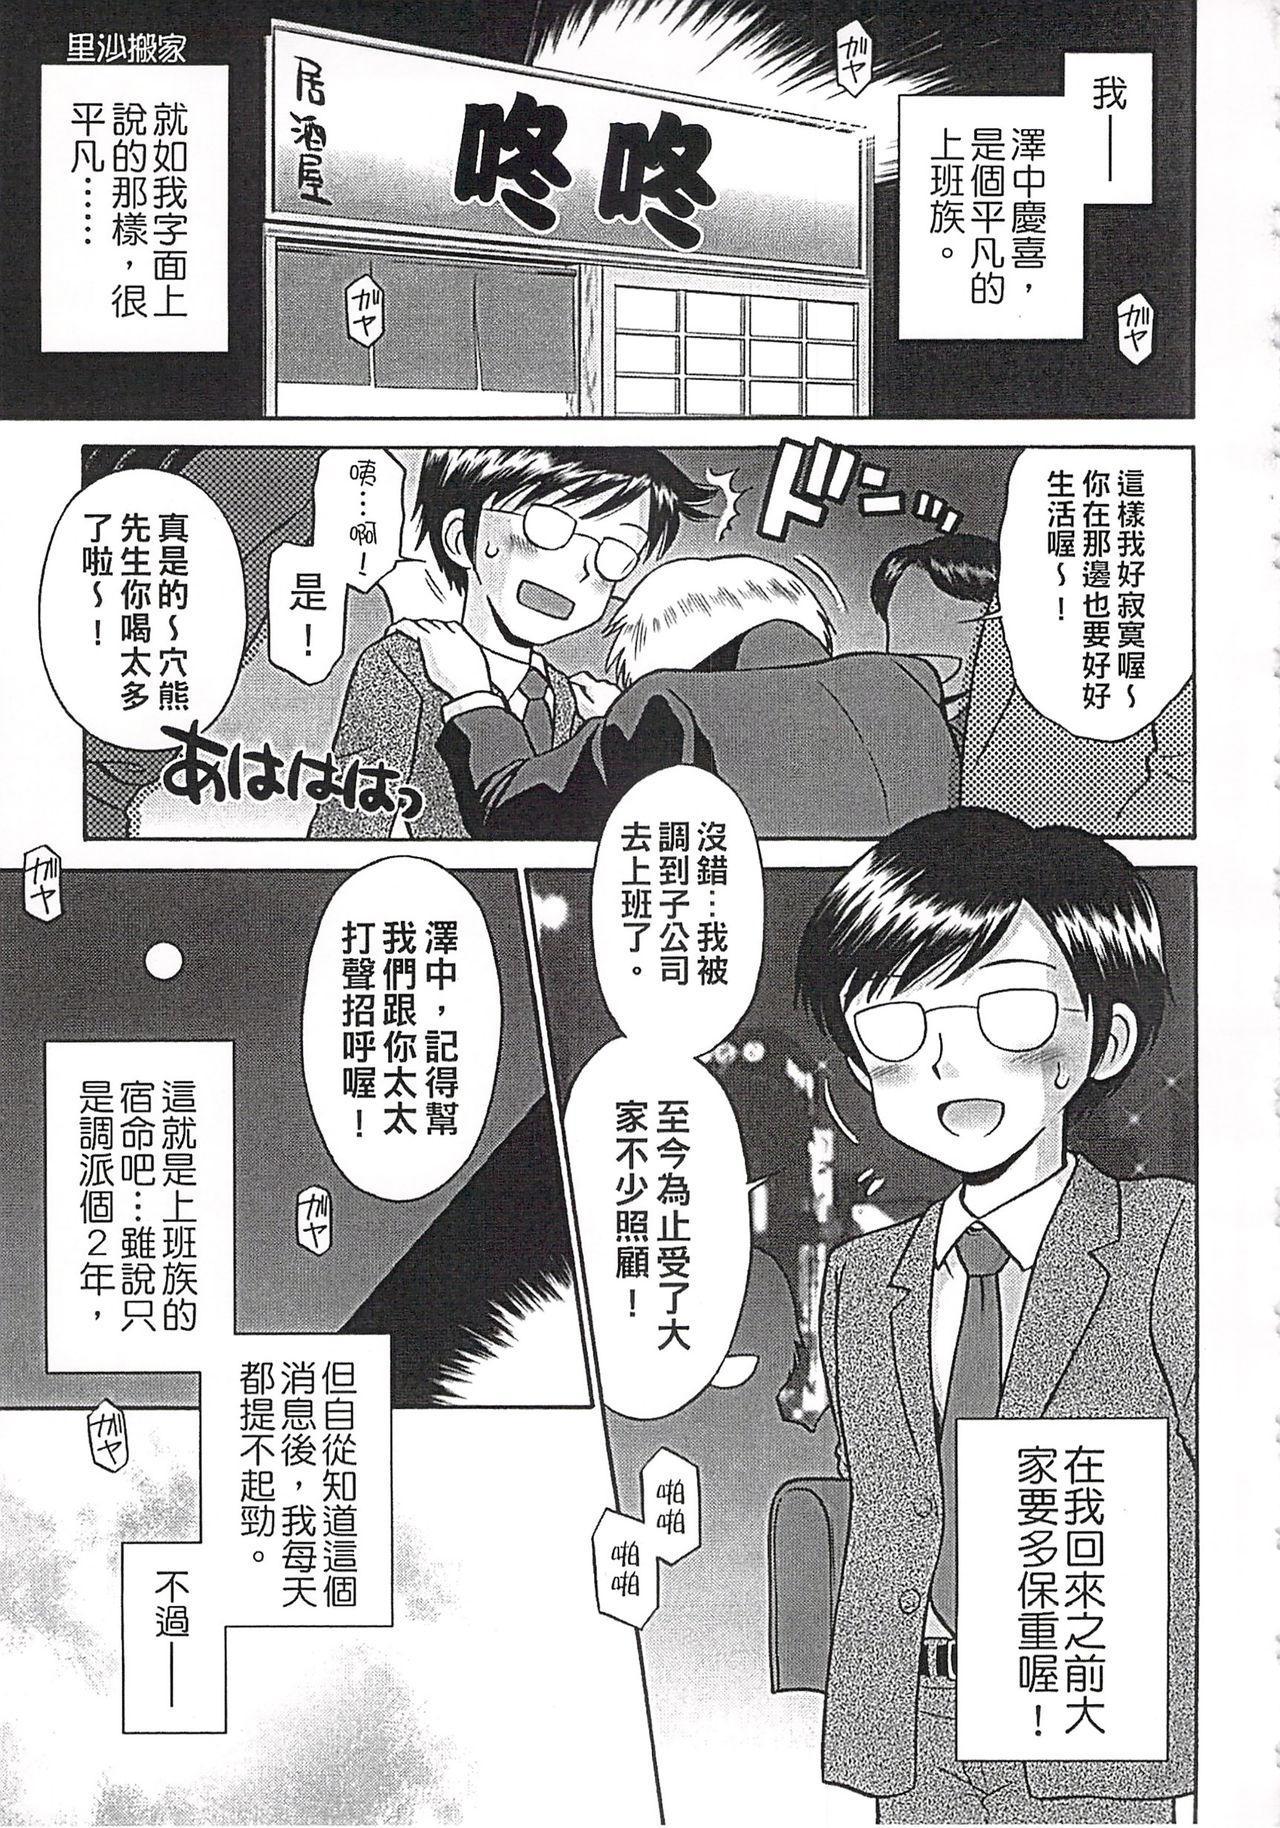 Kore demo Otona Desu Kedo!? Mrs.LOLITA Kanzenban   人家是大人啦! ~Mrs.LOLITA完全版 100